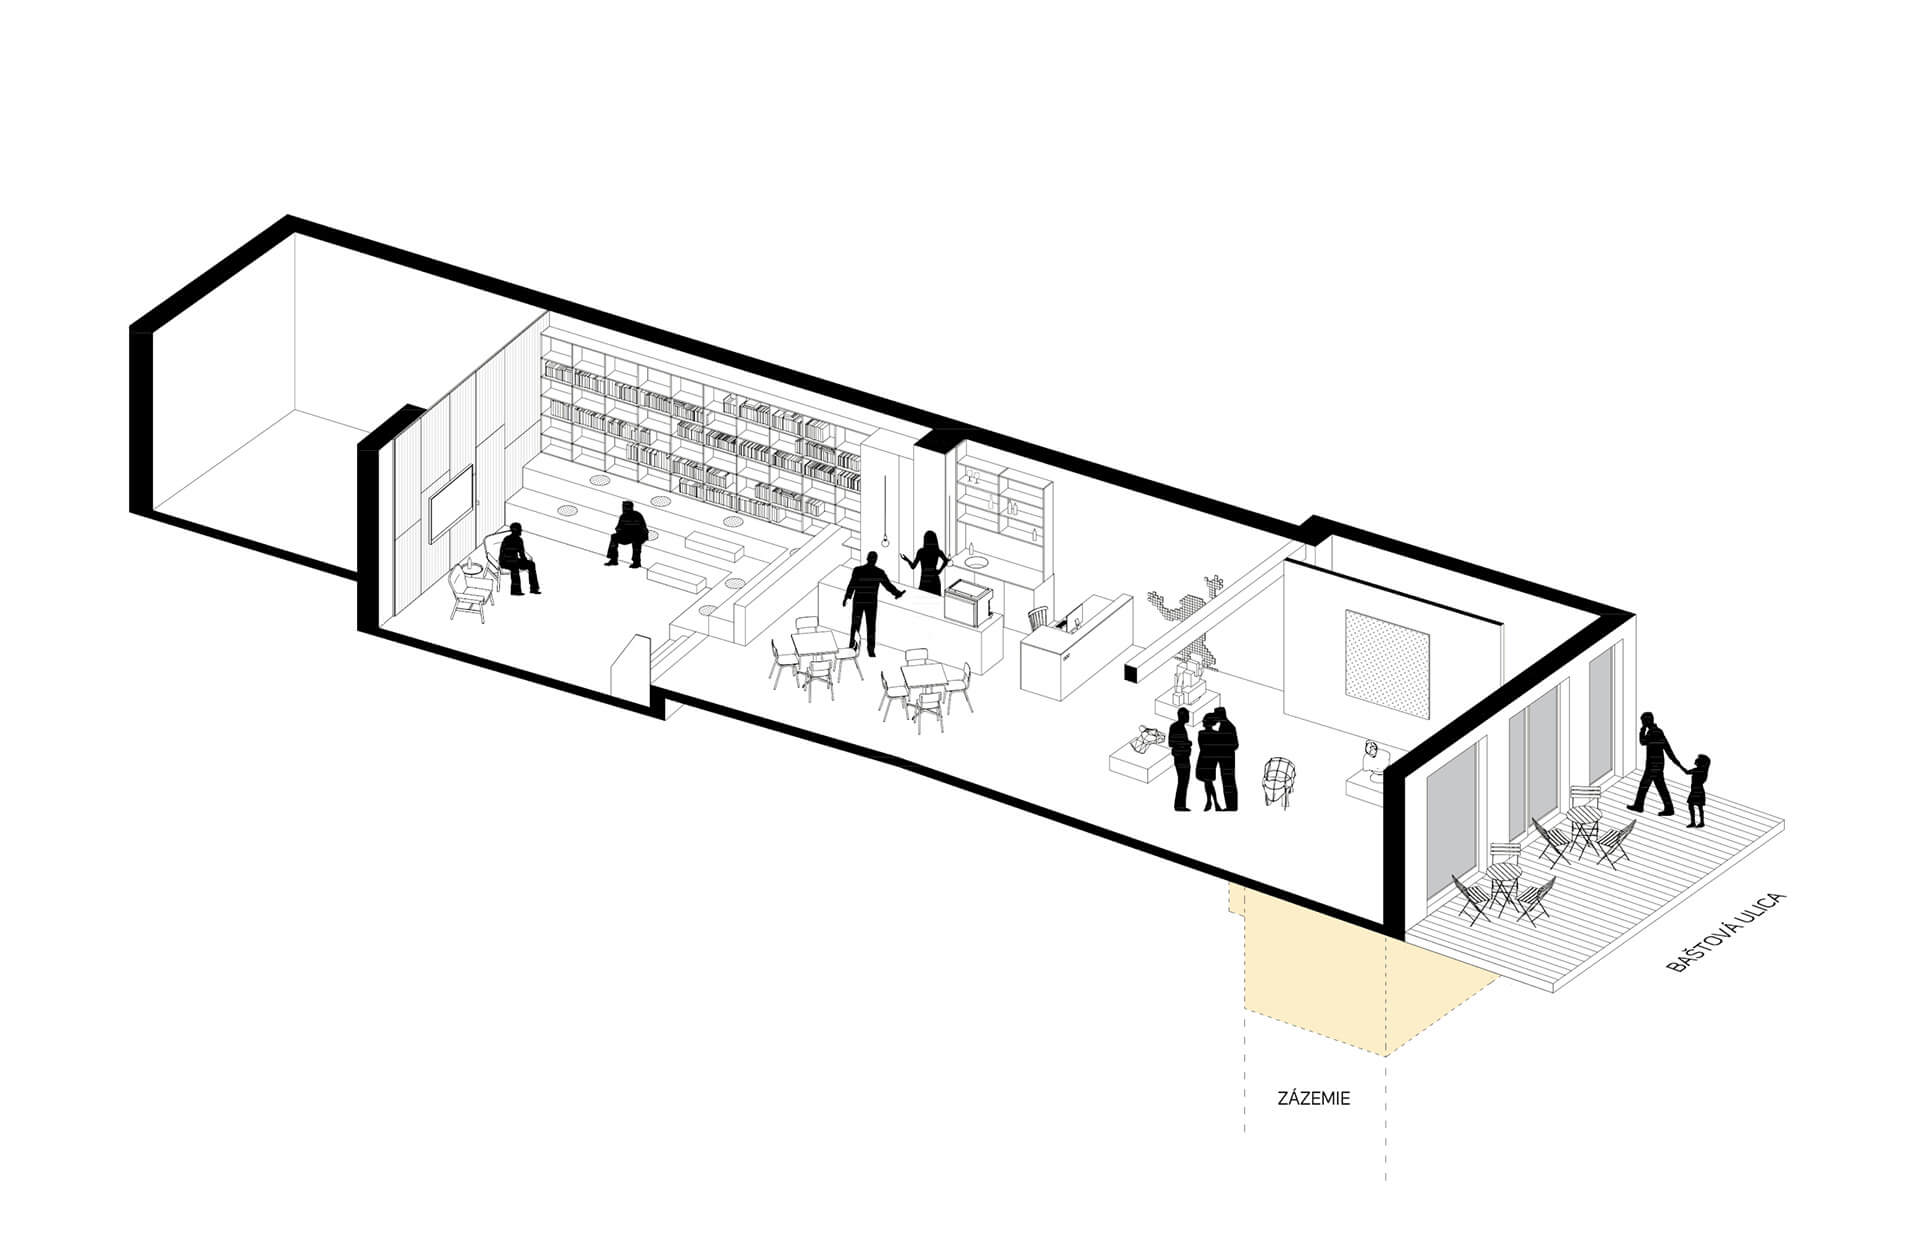 galeria-abc-bastova_schema_gif_6